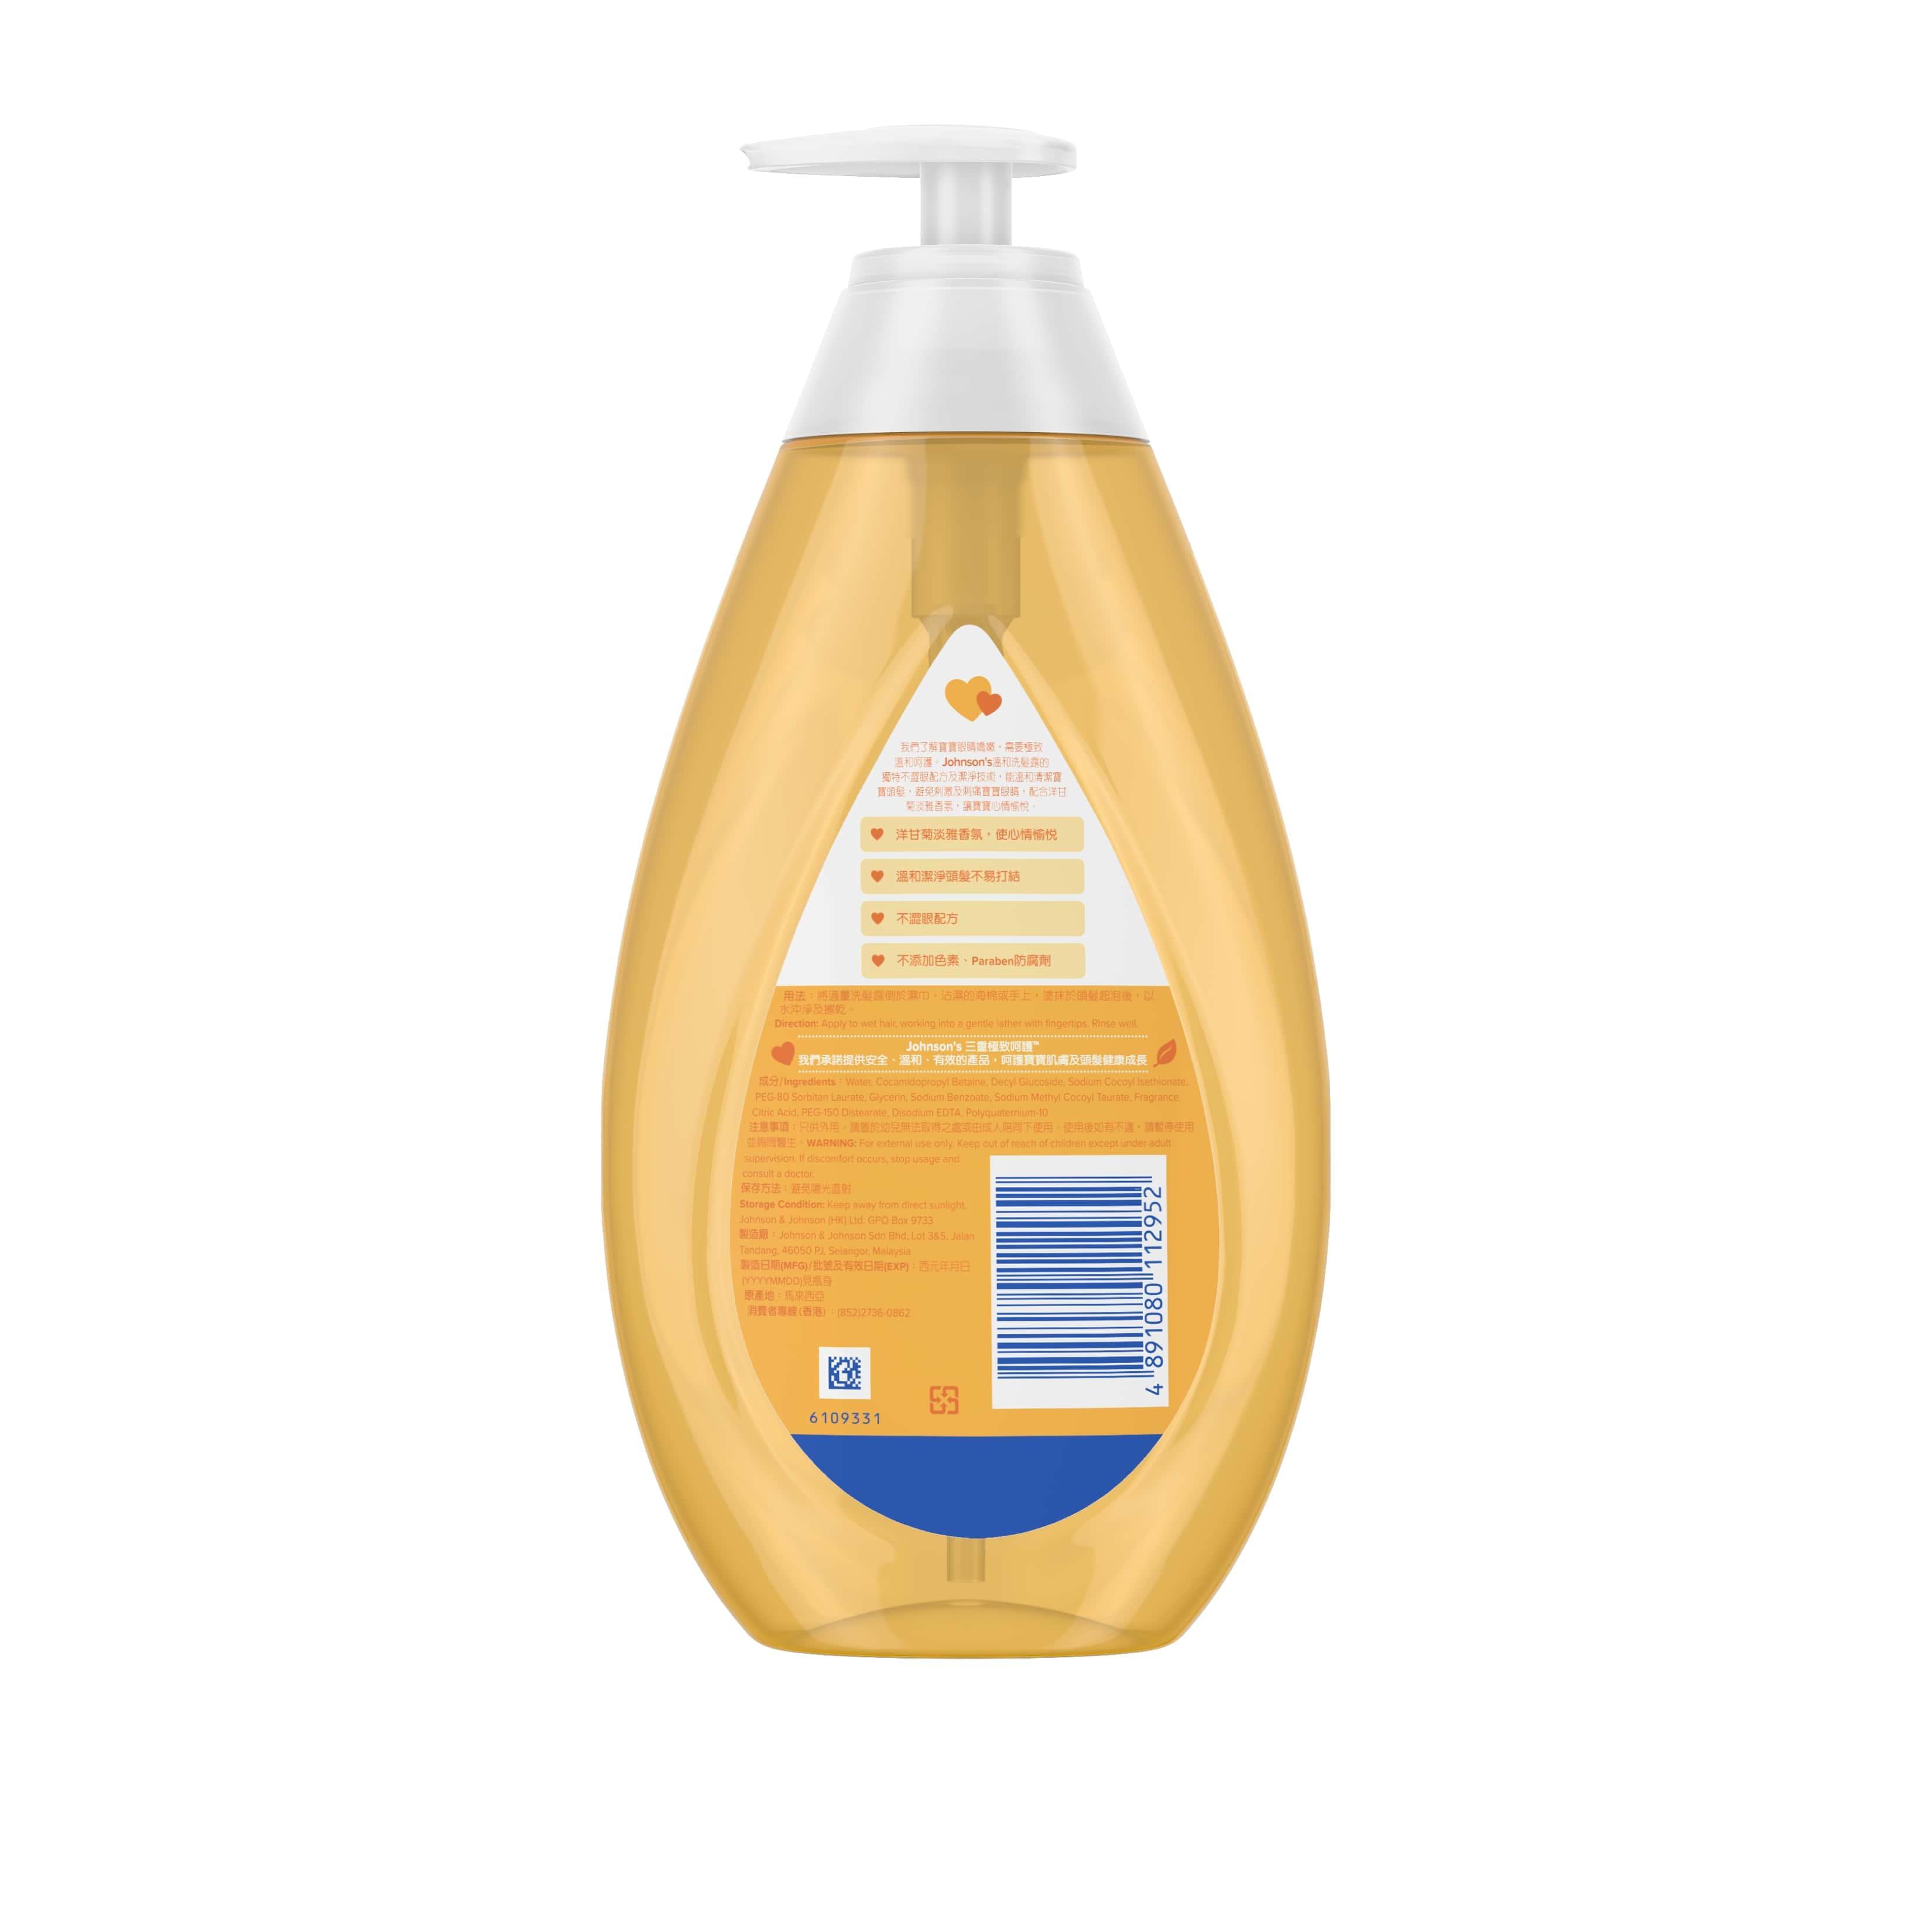 baby-shampoo-800ml-back.jpg